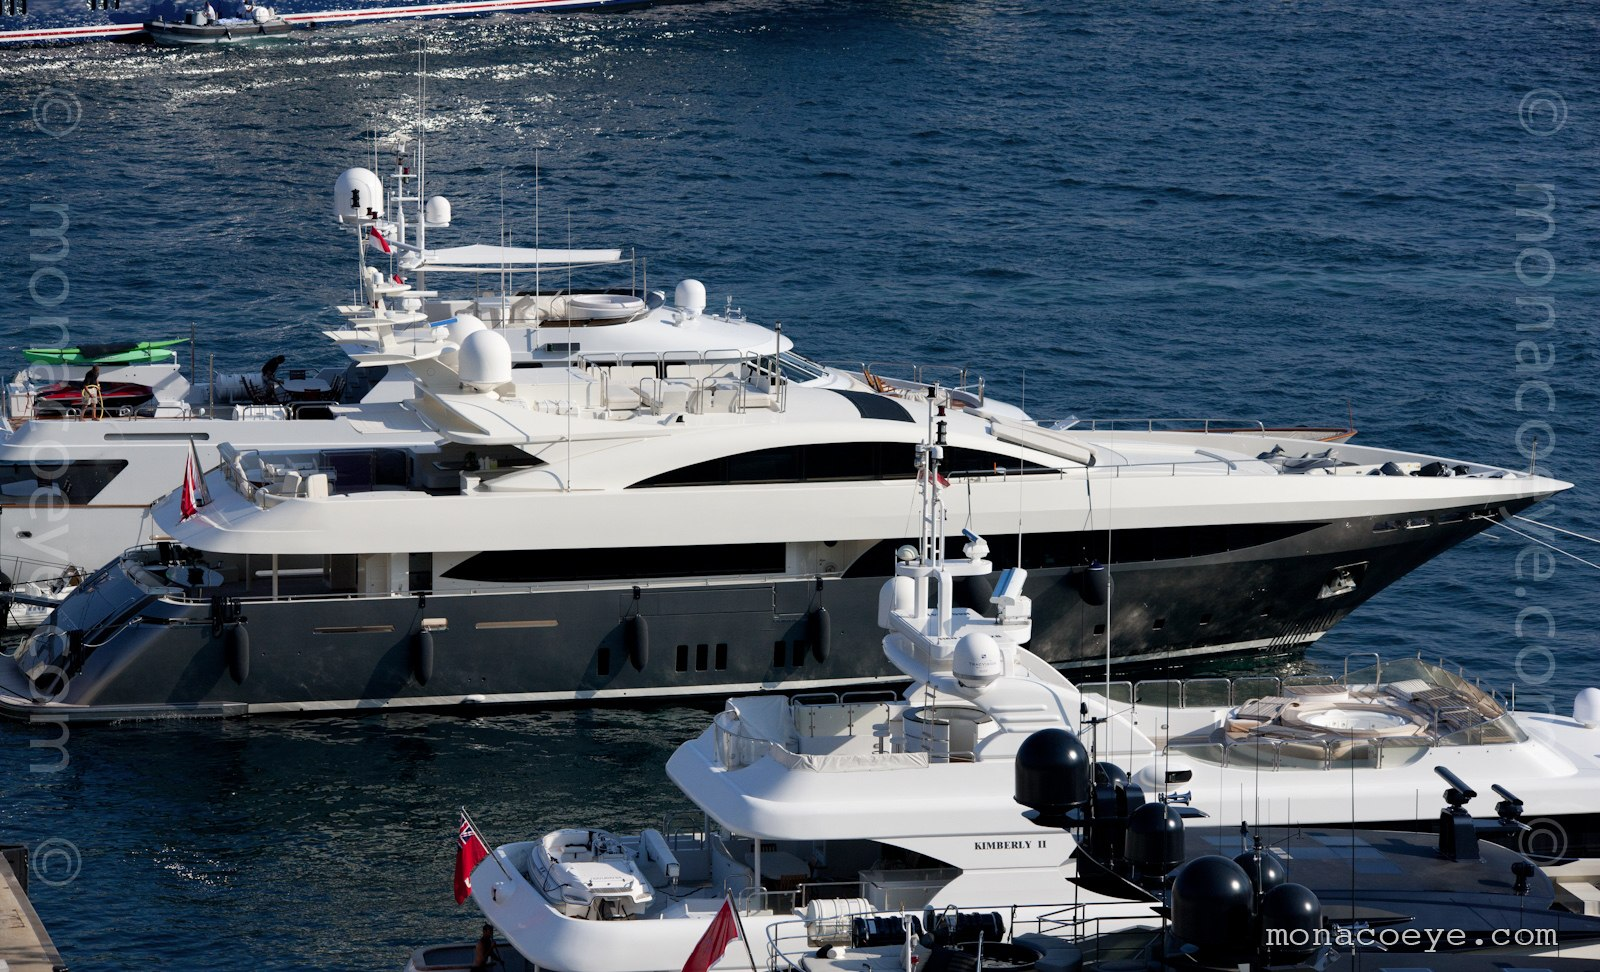 Sierra Romeo. Yacht built by Mondomarine, hull C18, 2008, 42 metres.